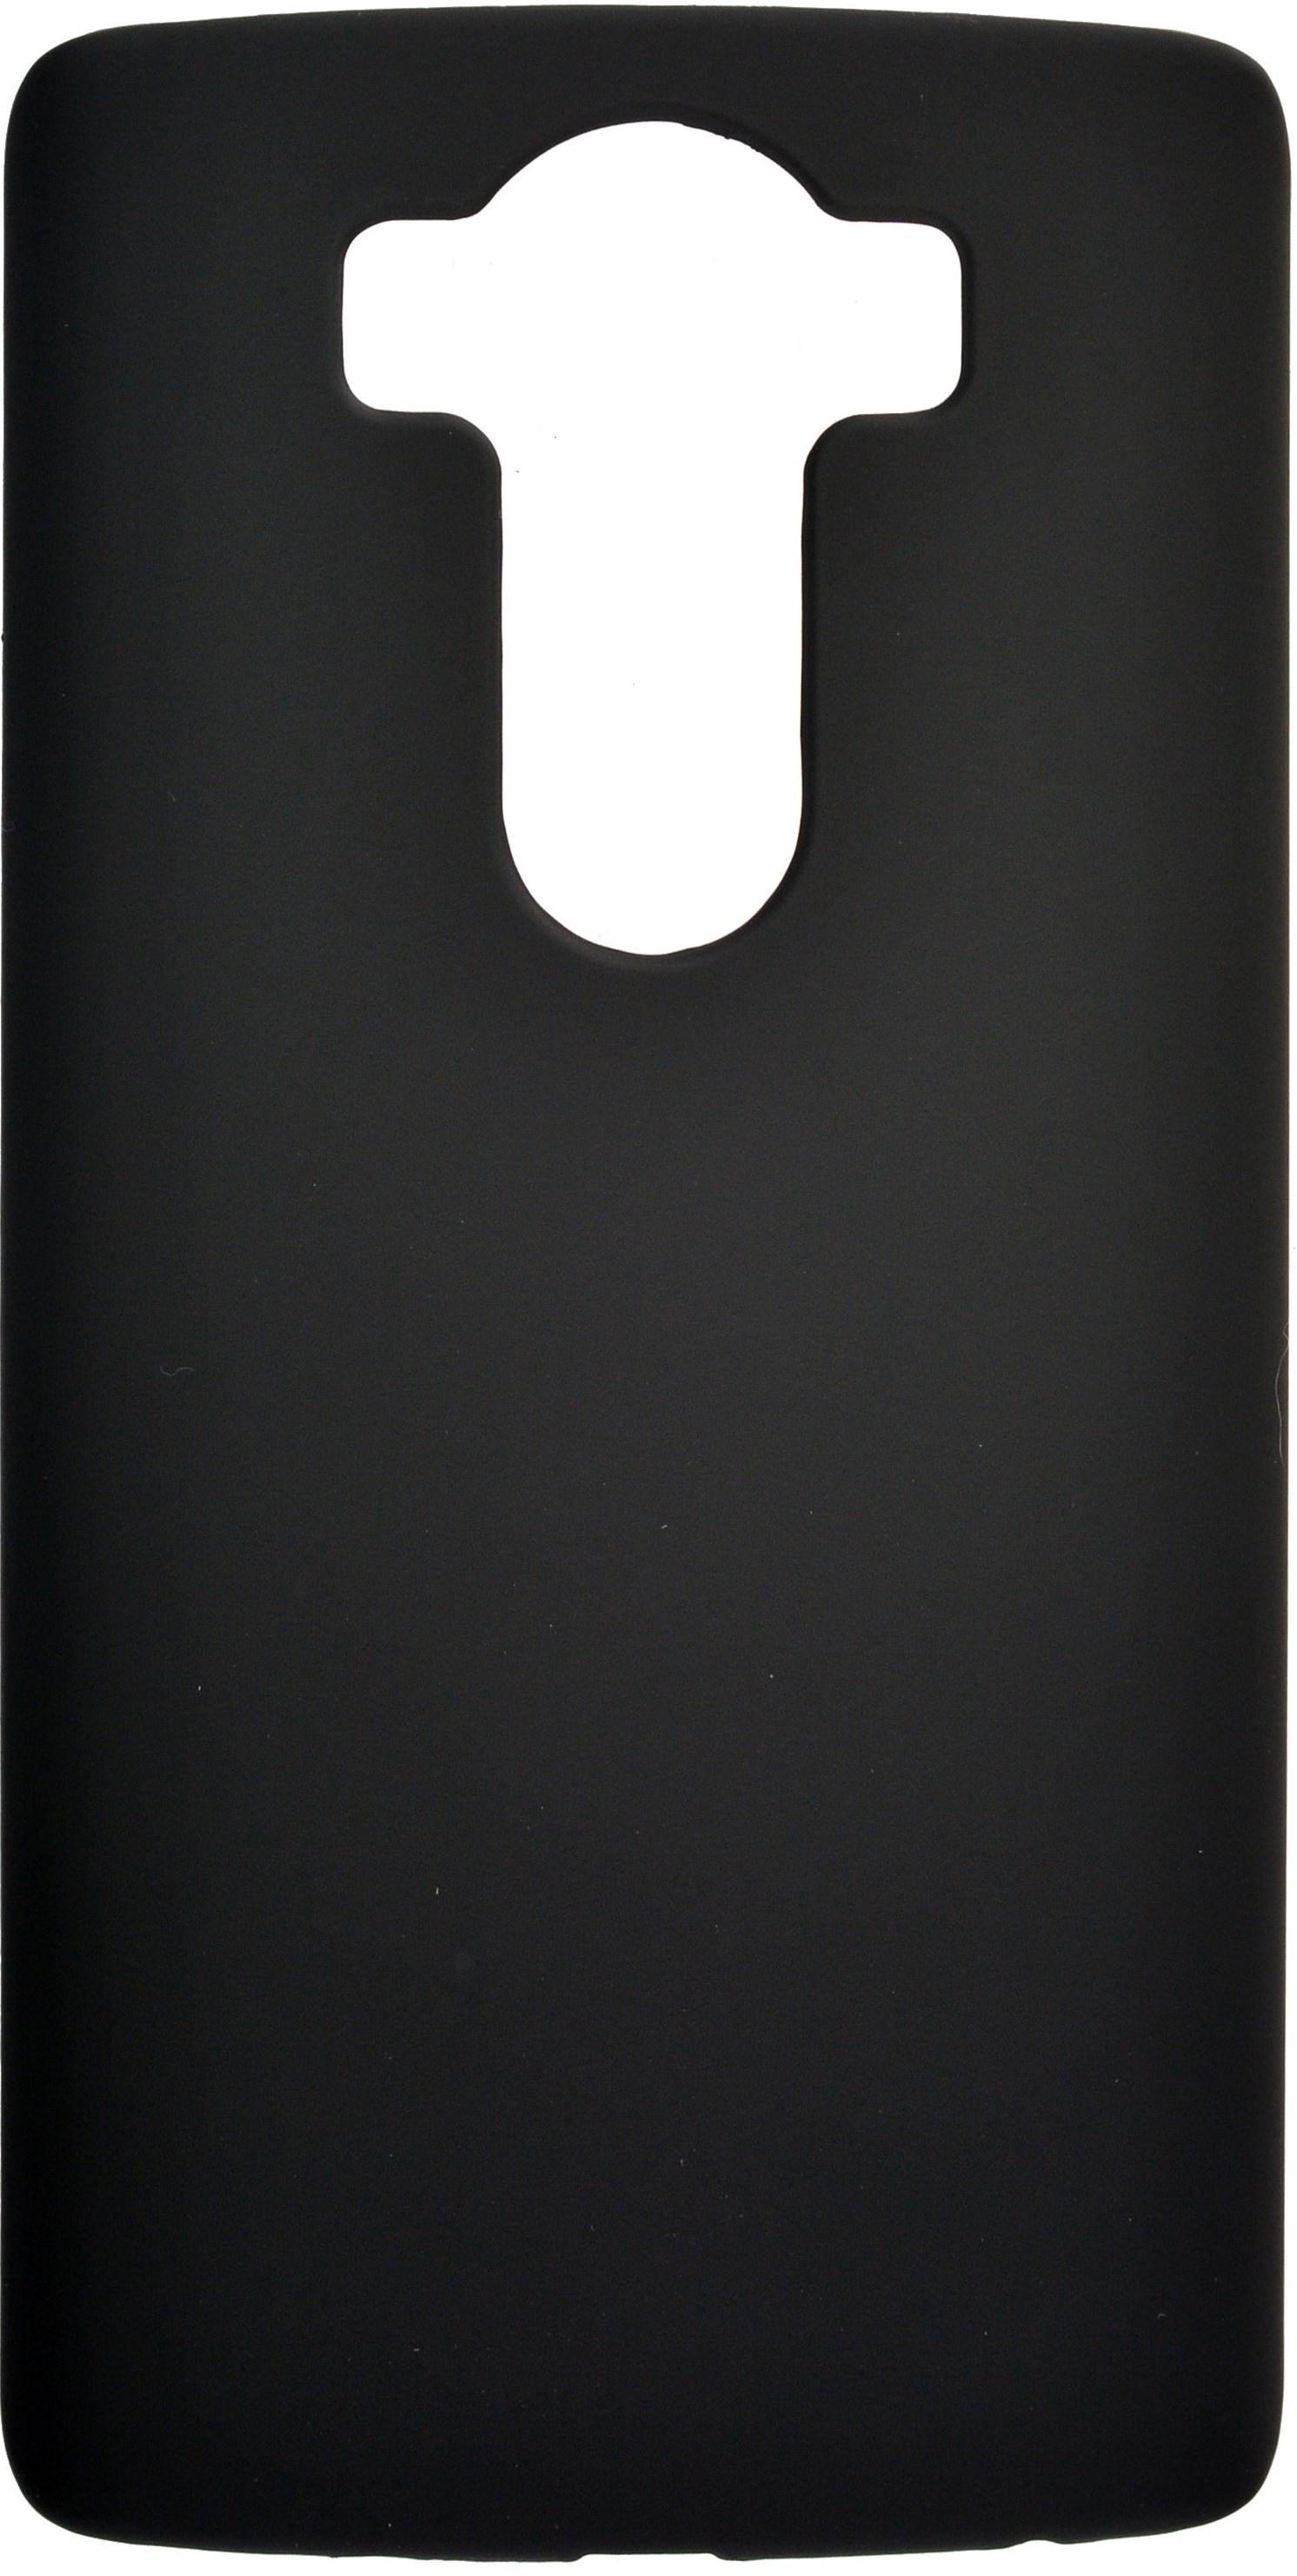 Накладка skinBOX для LG V10, 2000000085081, черный накладка skinbox для lg g4s 2000000079226 черный